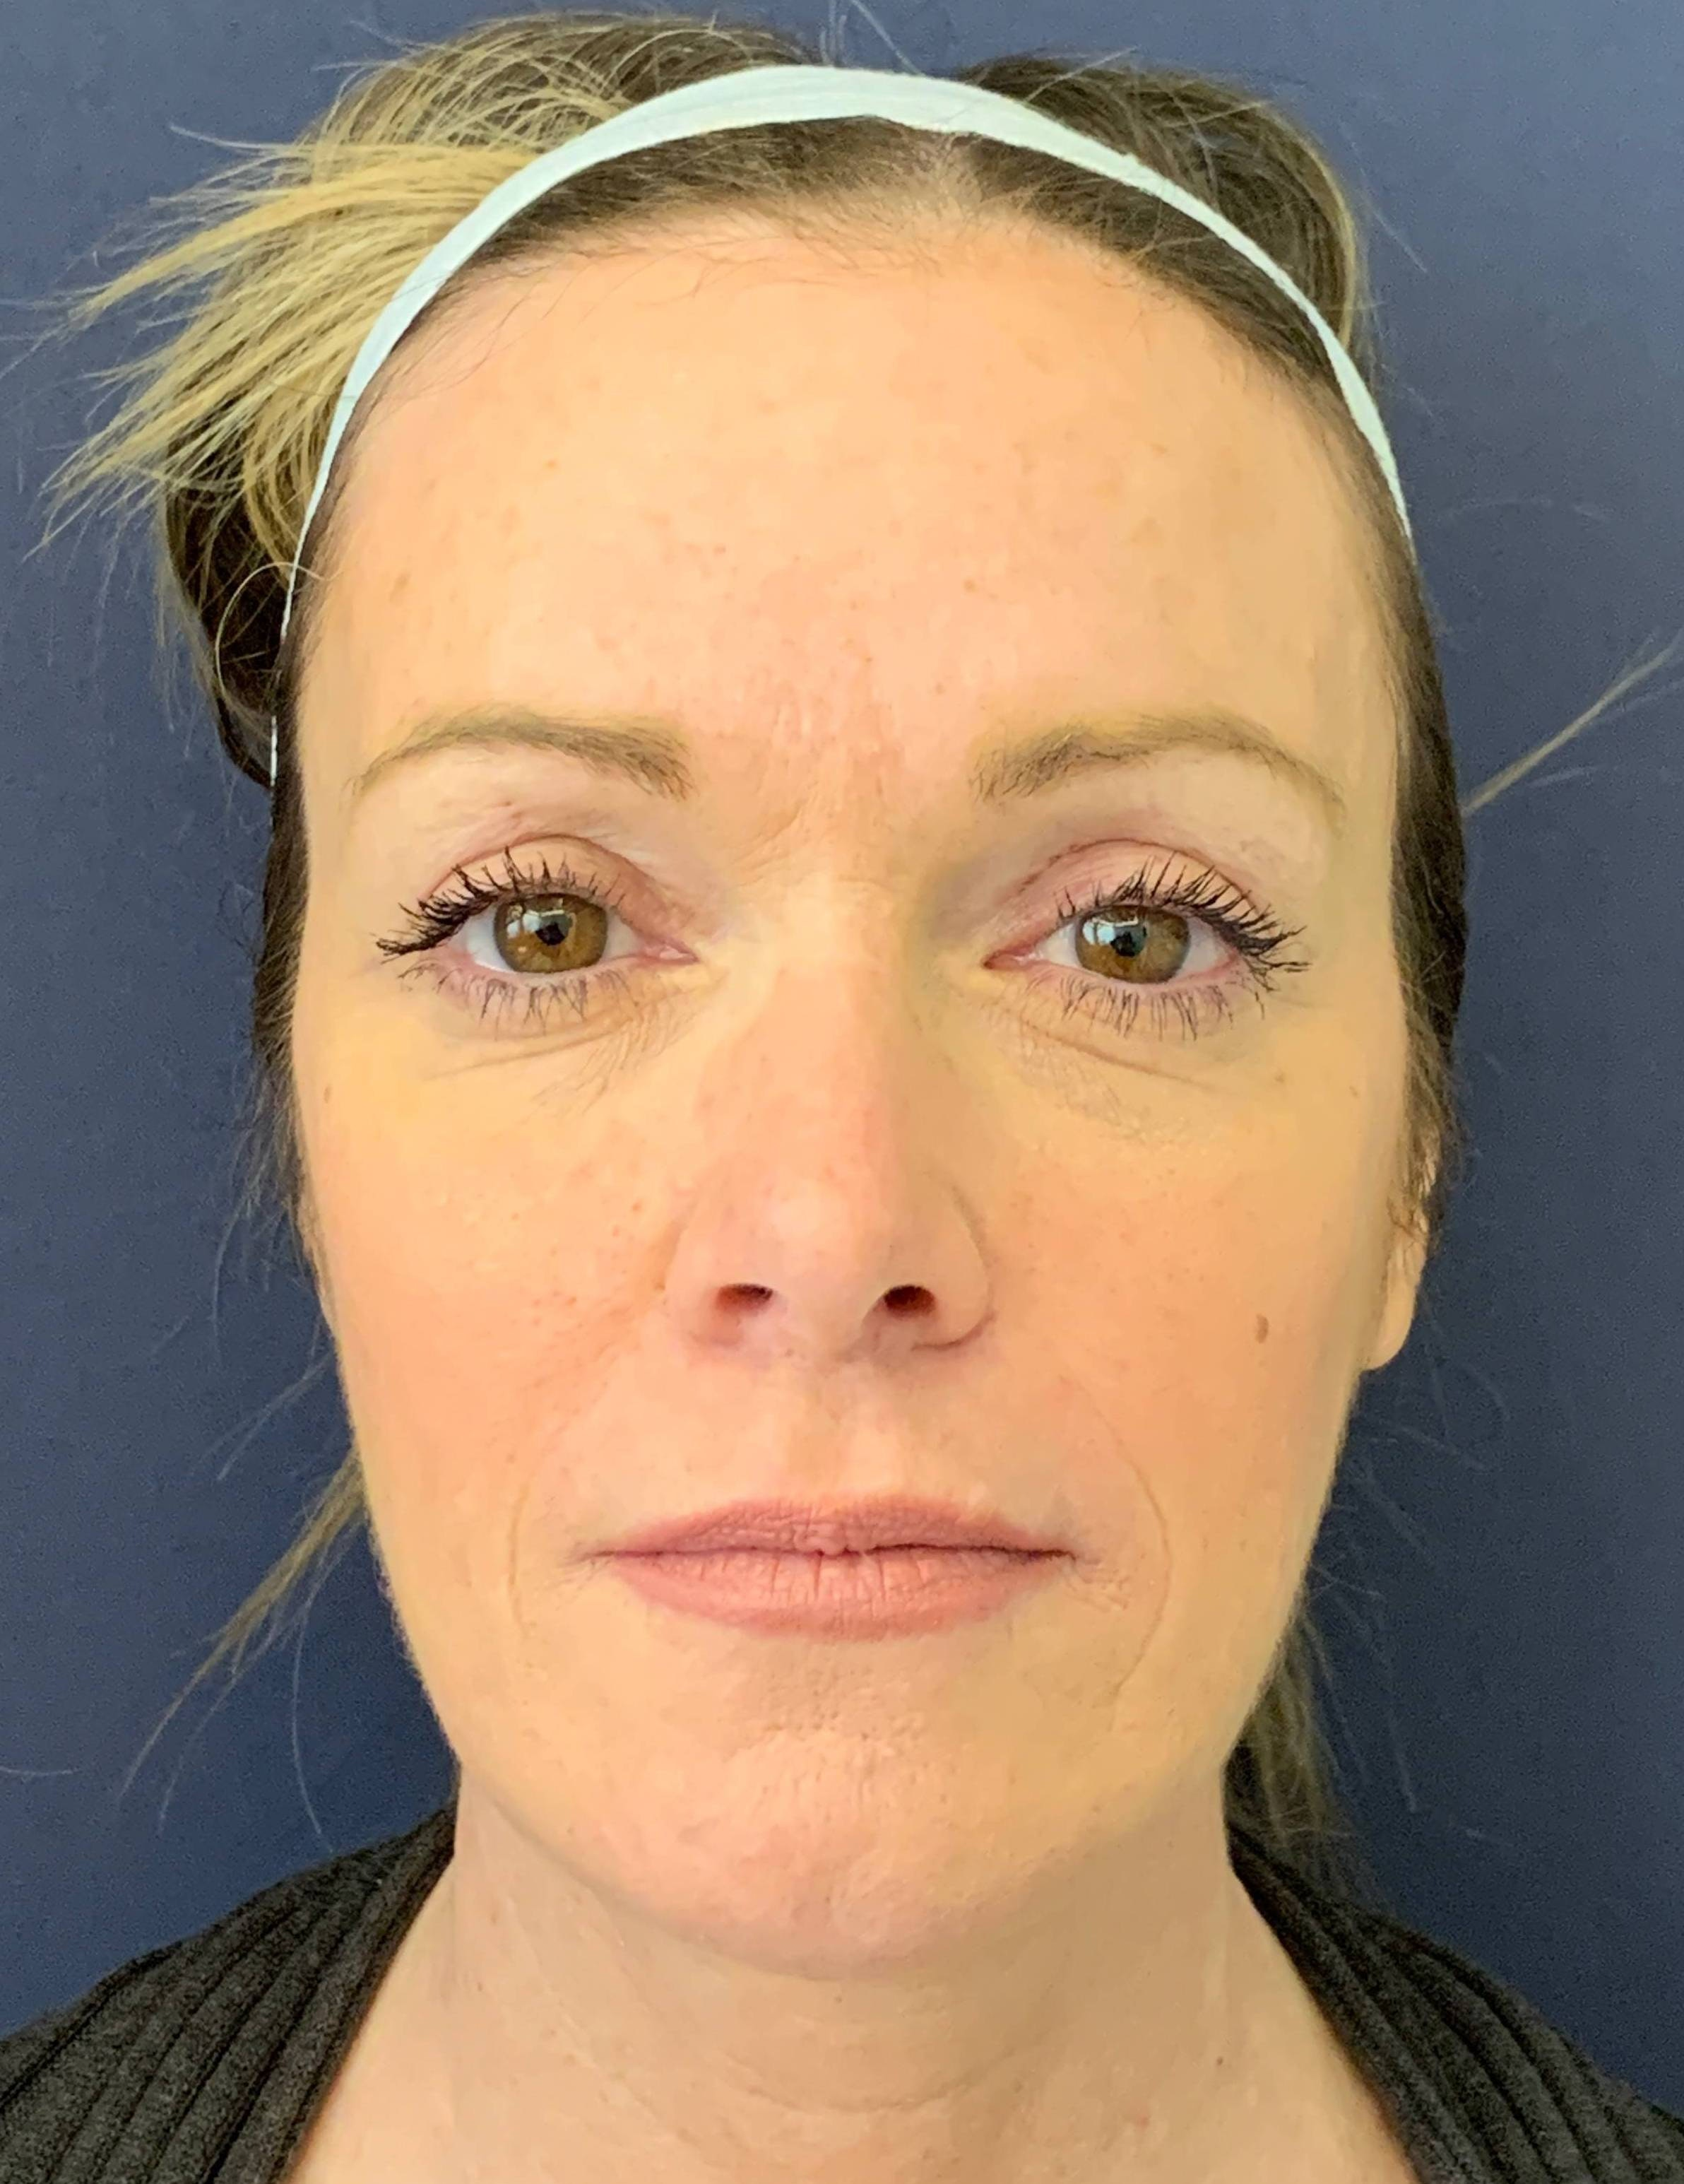 Blepharoplasty (Eyelid Surgery) Gallery - Patient 4447876 - Image 2